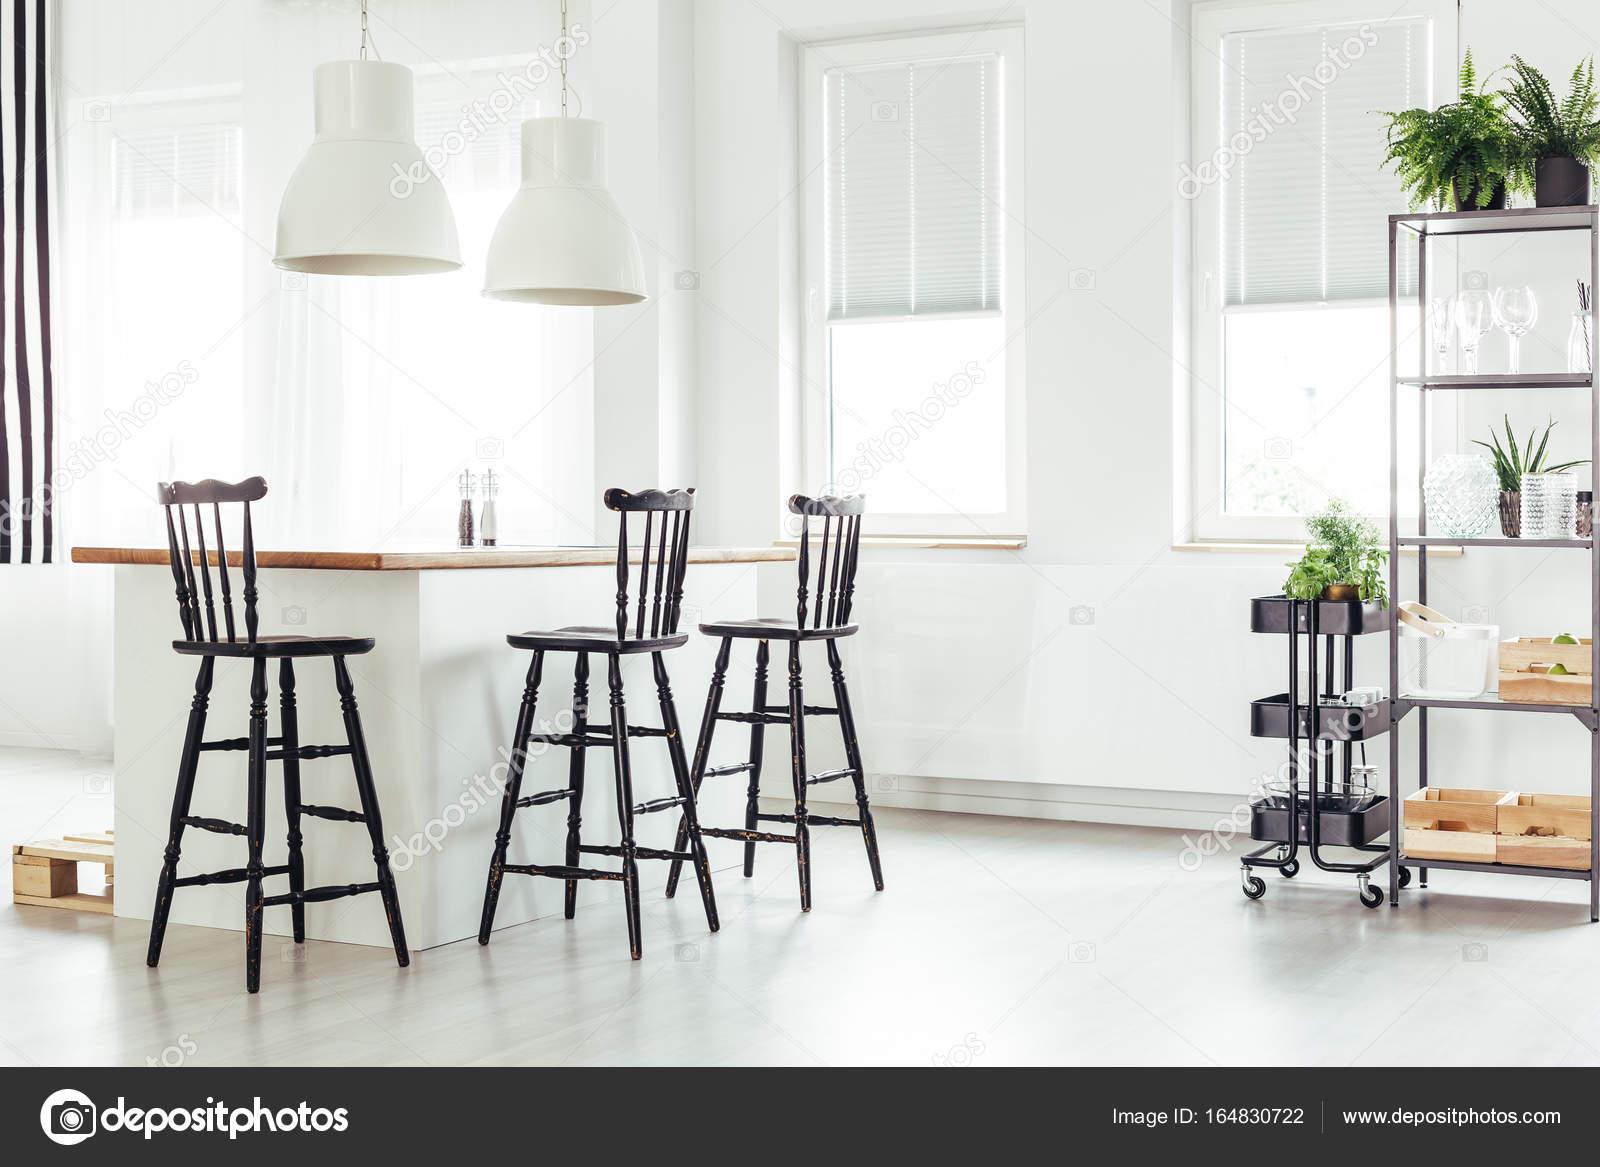 kitchen island with bar remodeling nj 在窗口下厨房岛 图库照片 c photographee eu 164830722 白色的灯以上厨房岛下一个带有黑色酒吧用的凳子在明亮的房间 植物中的窗口 照片作者photographee